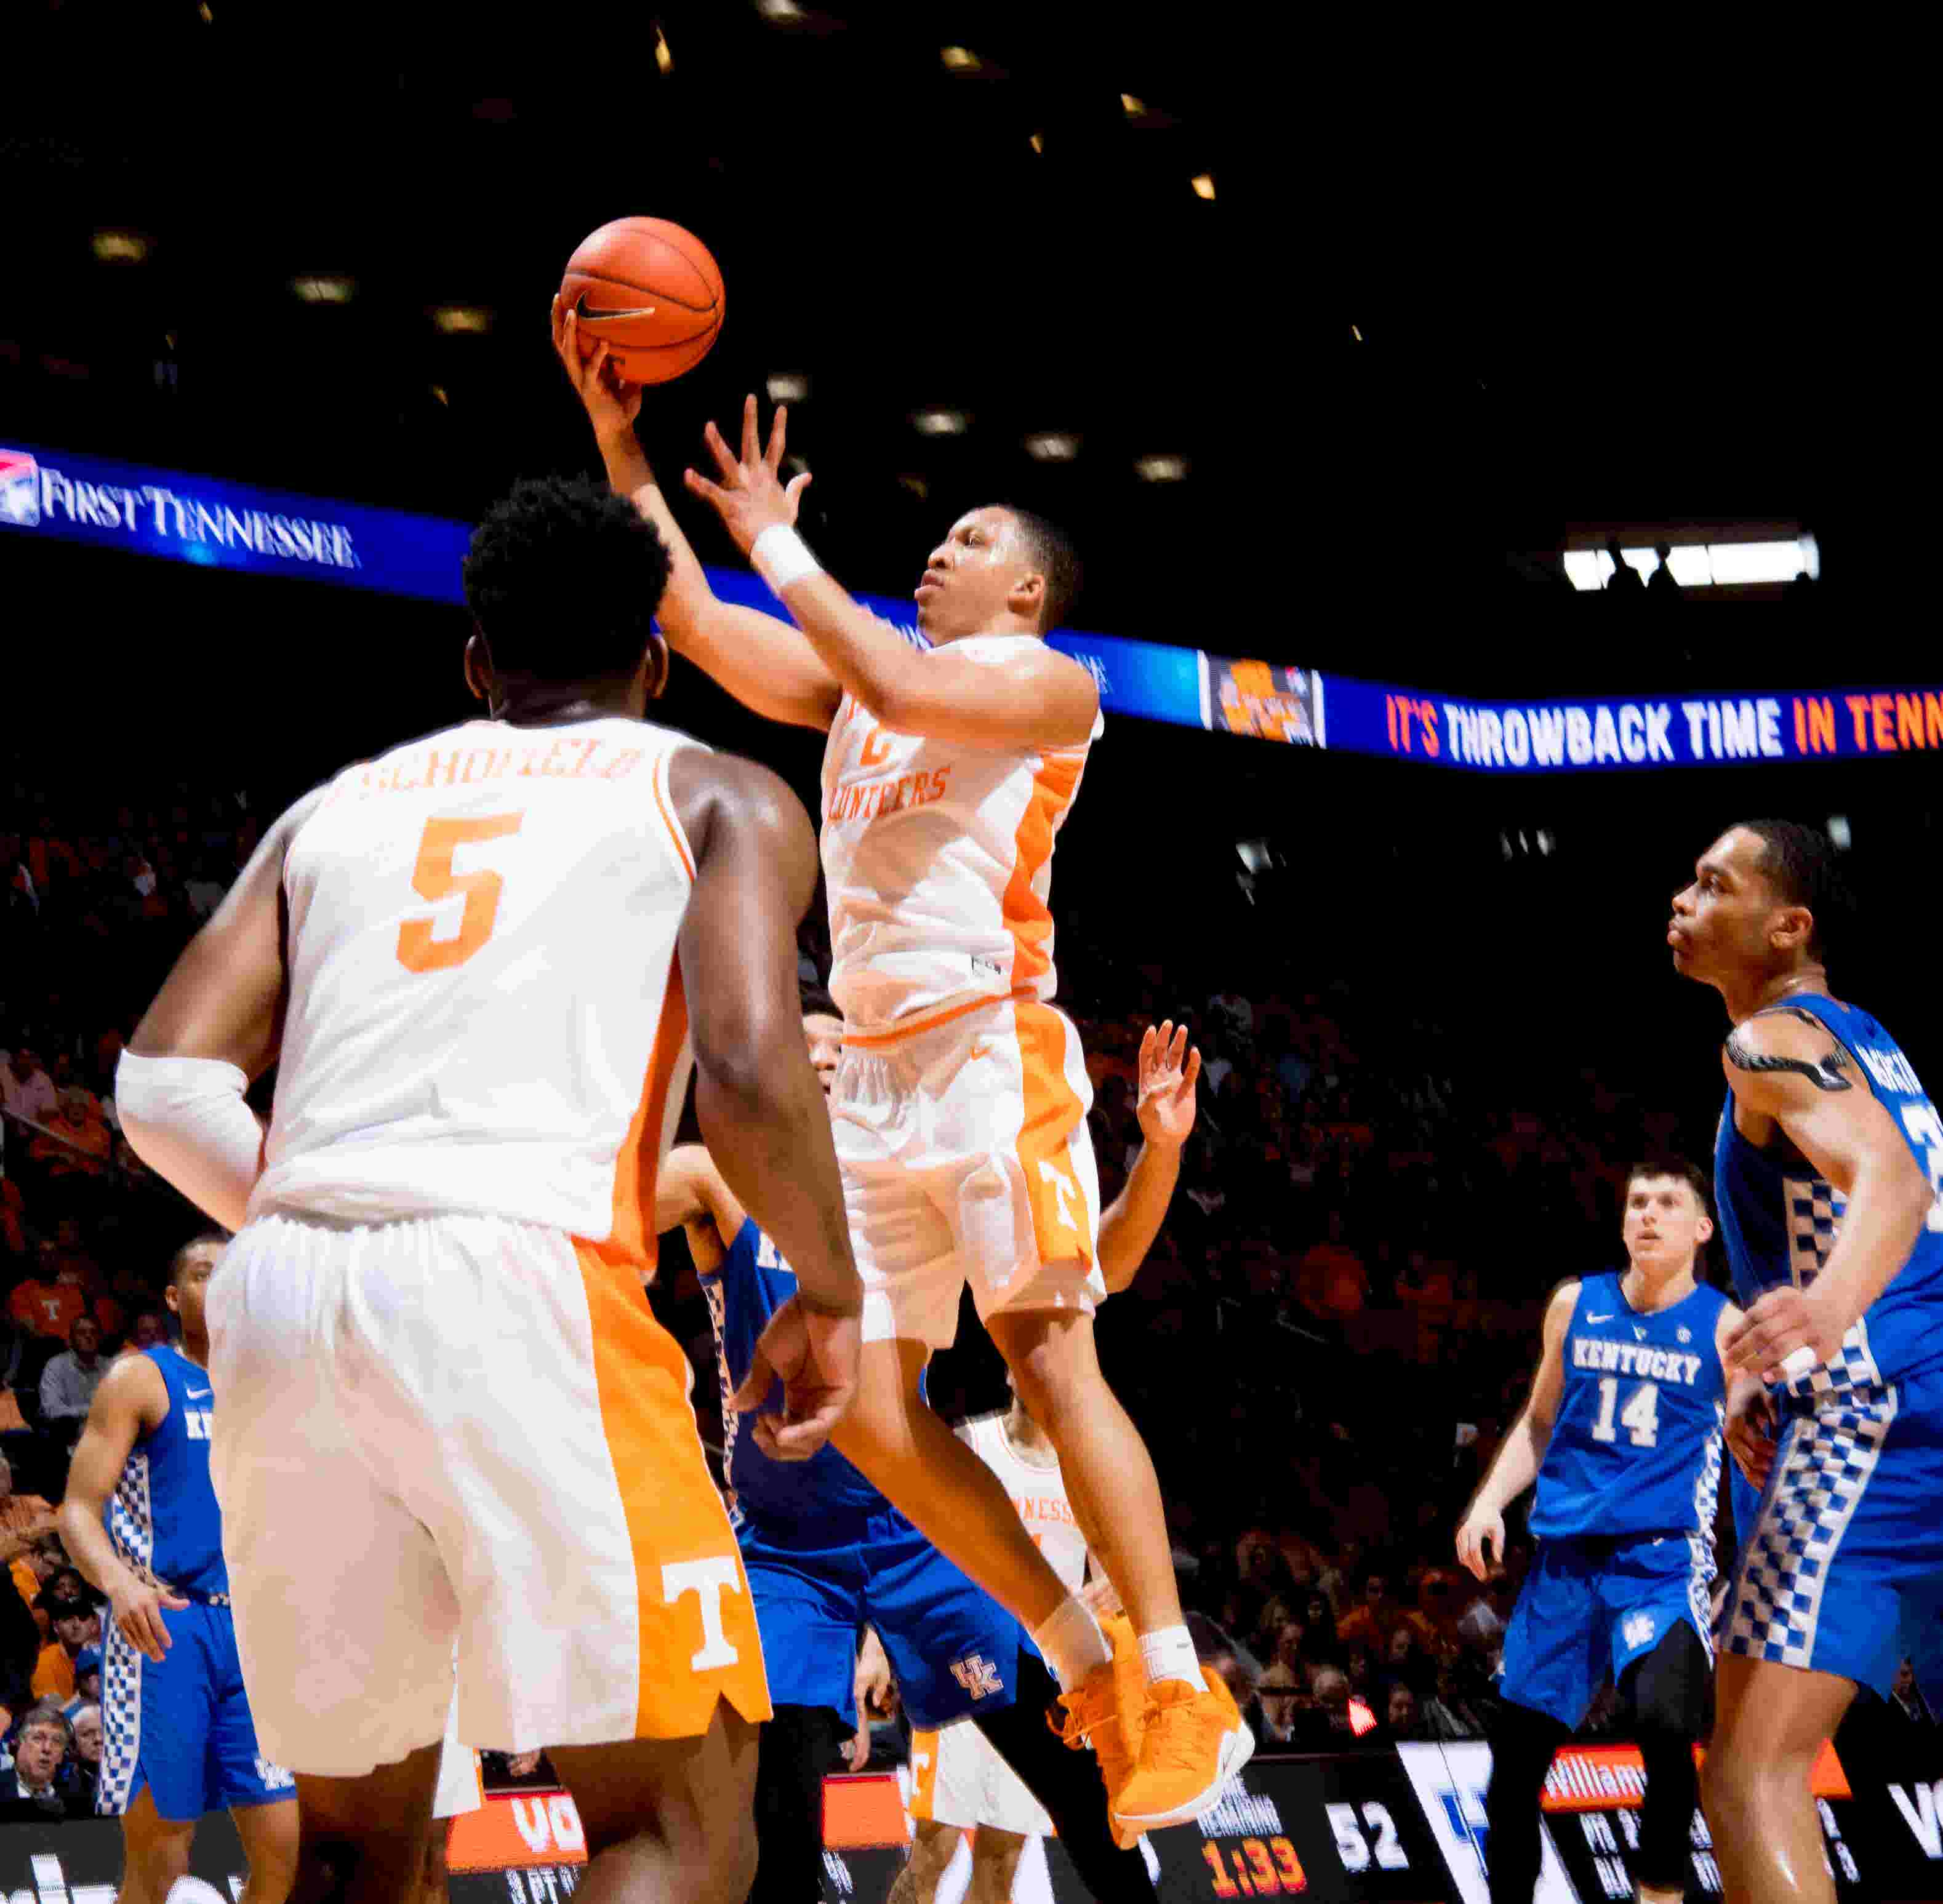 2019 Sec Men S Basketball Tournament Bracket Tennessee Vs